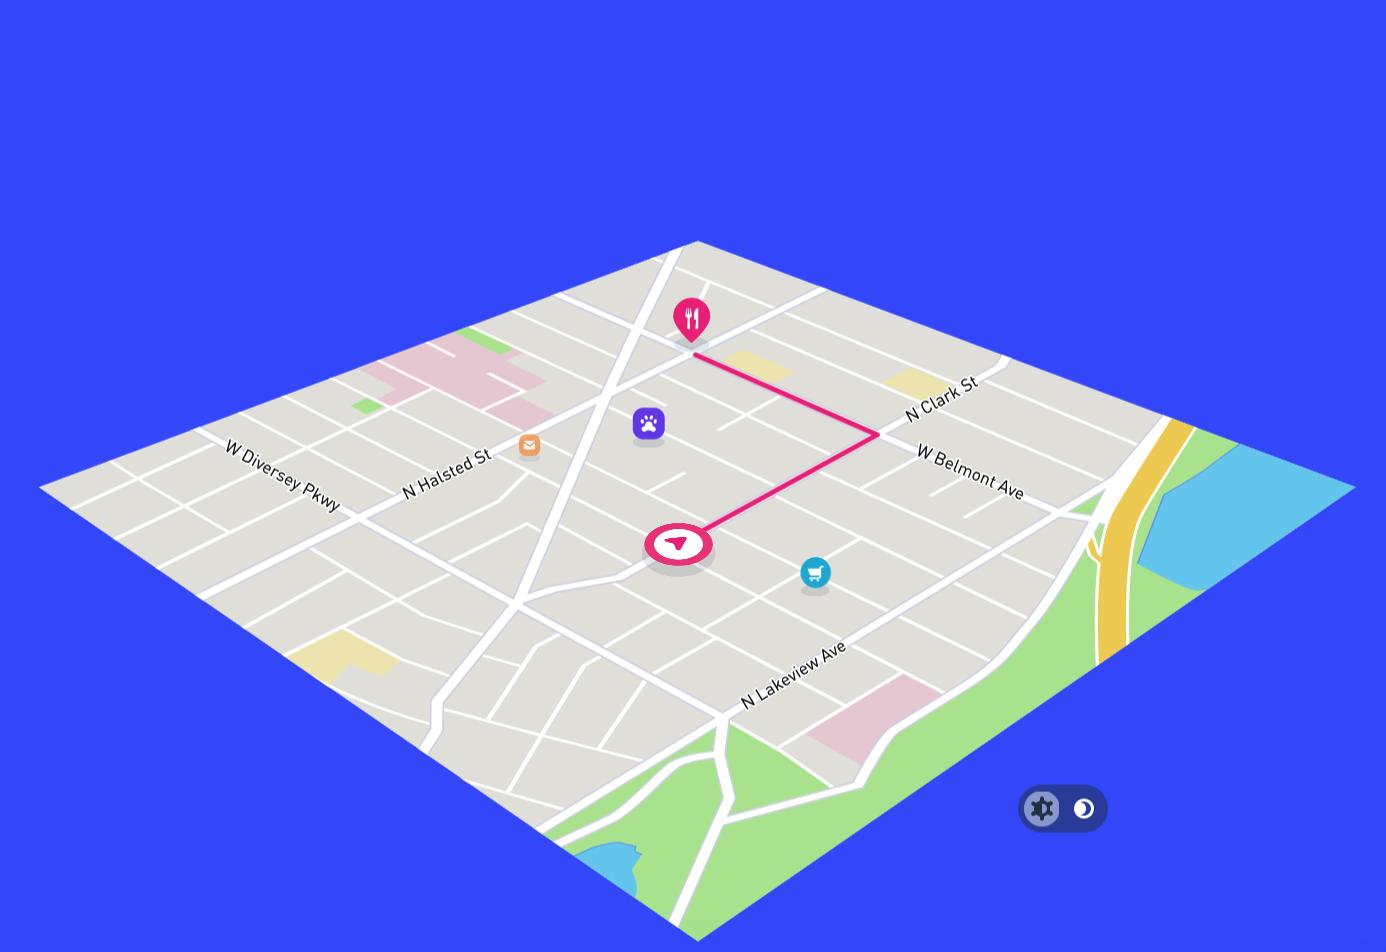 Mapbox GL JS学习笔记一:本地使用搭建矢量瓦片服务器- 知乎